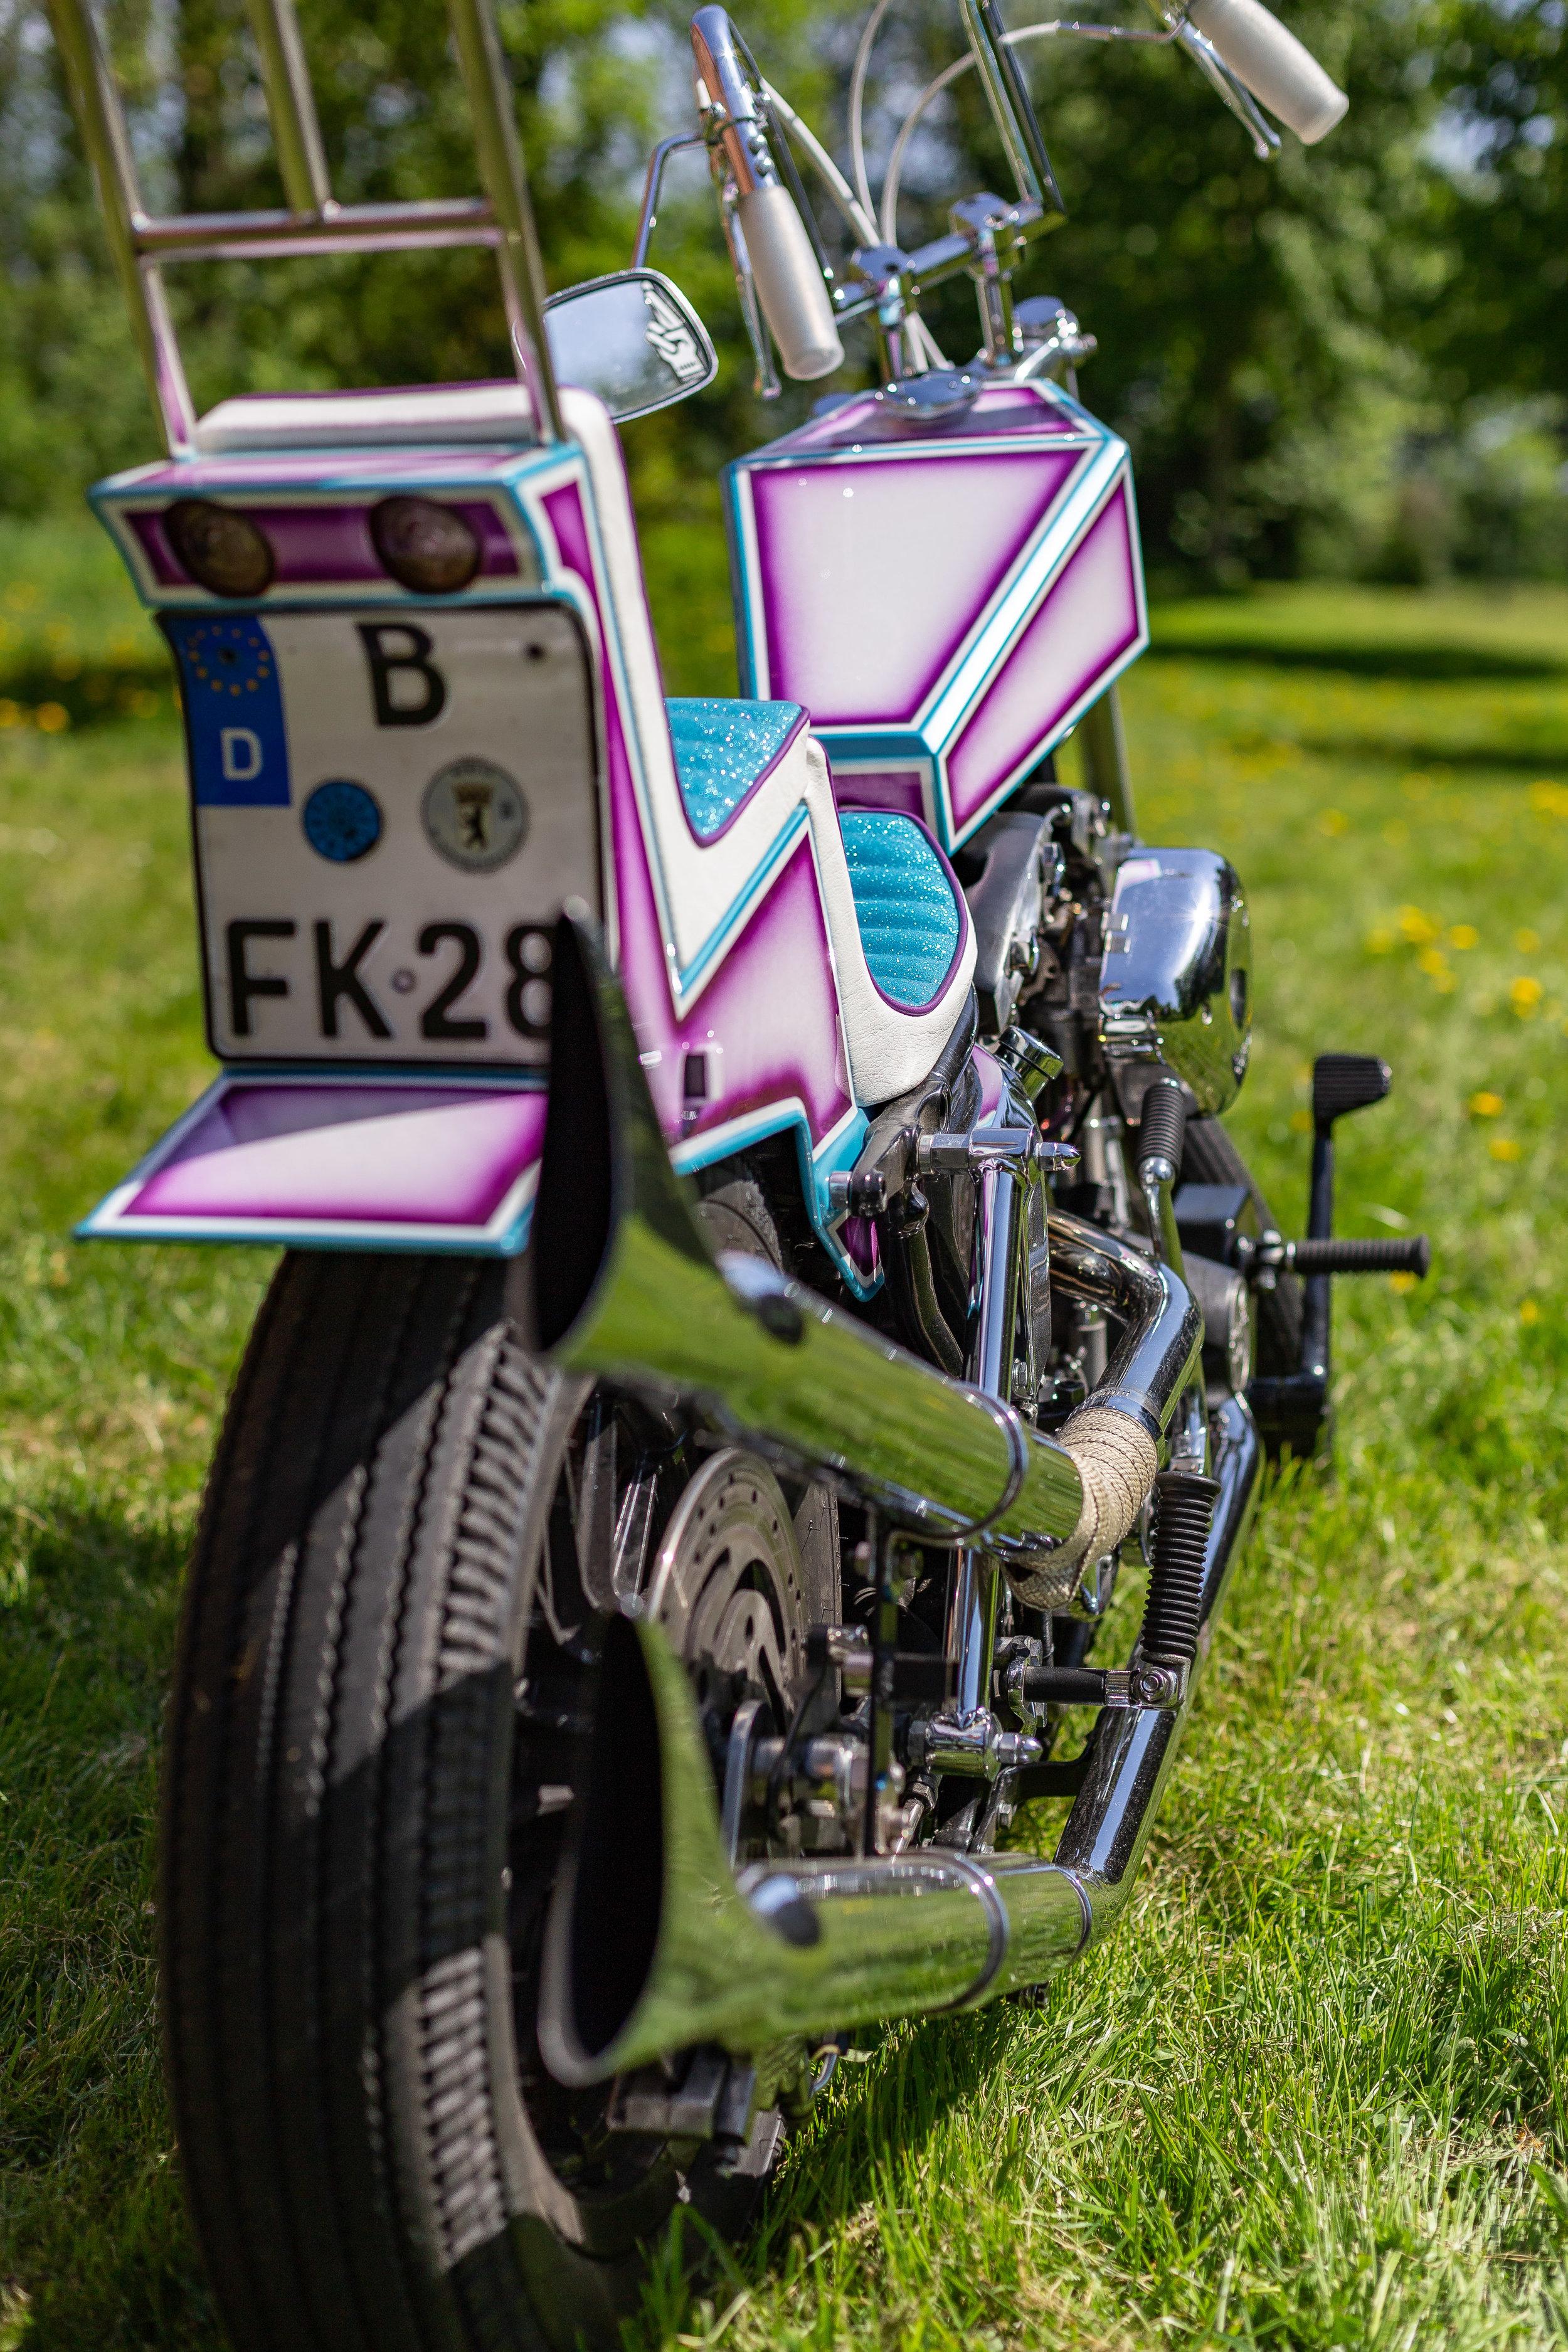 (c) Stefan Weidner Fotografie_Toxic Bikes_Karls Ofen_10-05-2018_IMG-0182.jpg